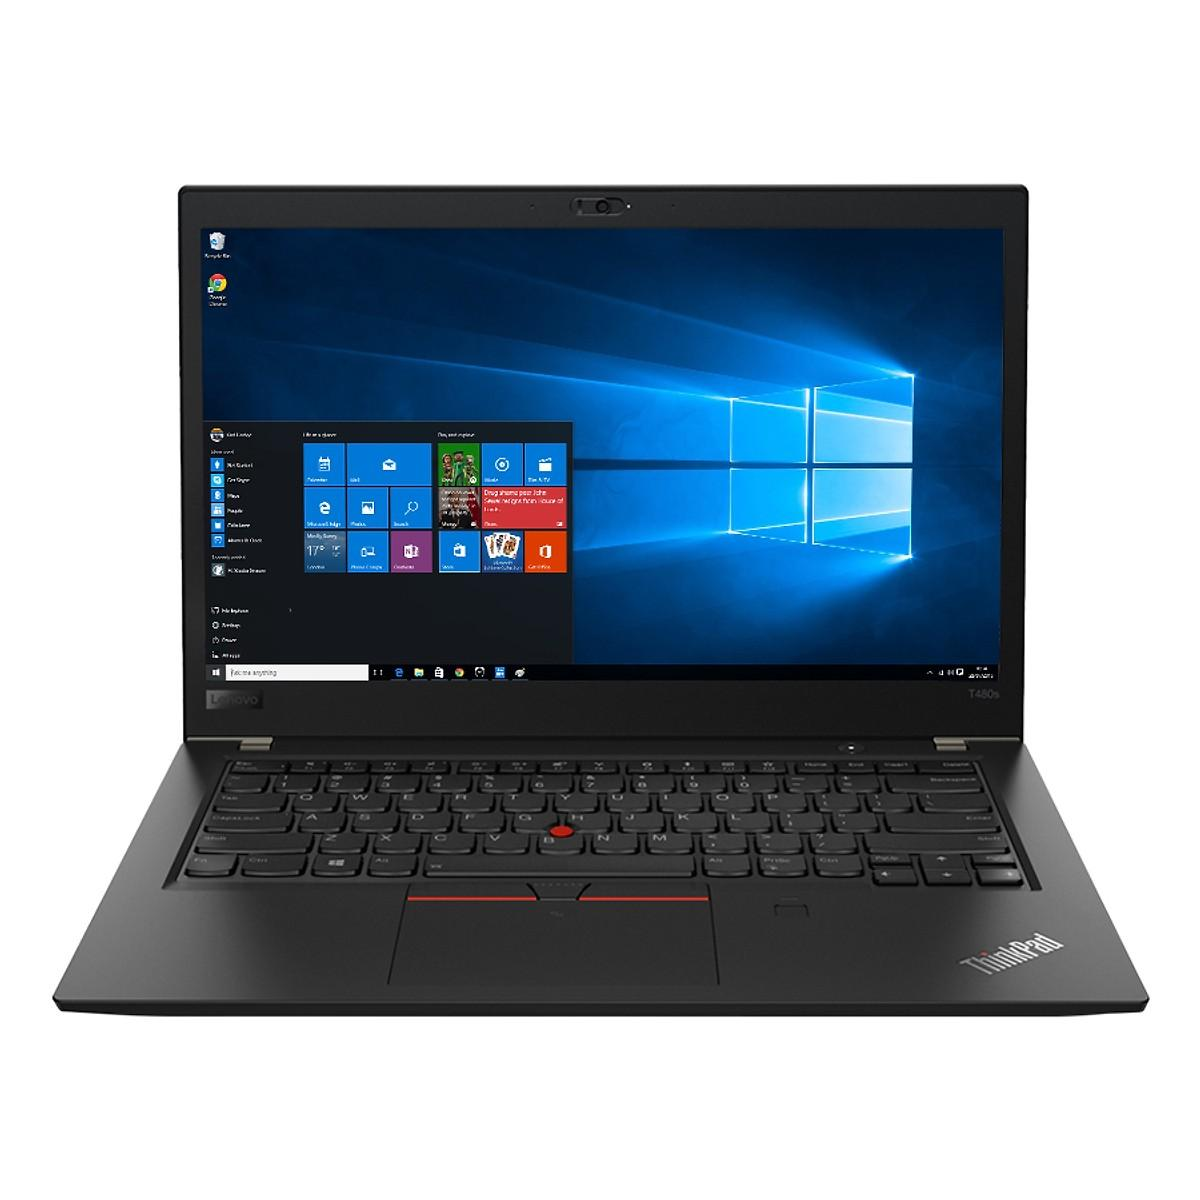 Laptop Lenovo ThinkPad T480 20L5S01400 Core i5-8250U/Free Dos (14 inch) (Black)